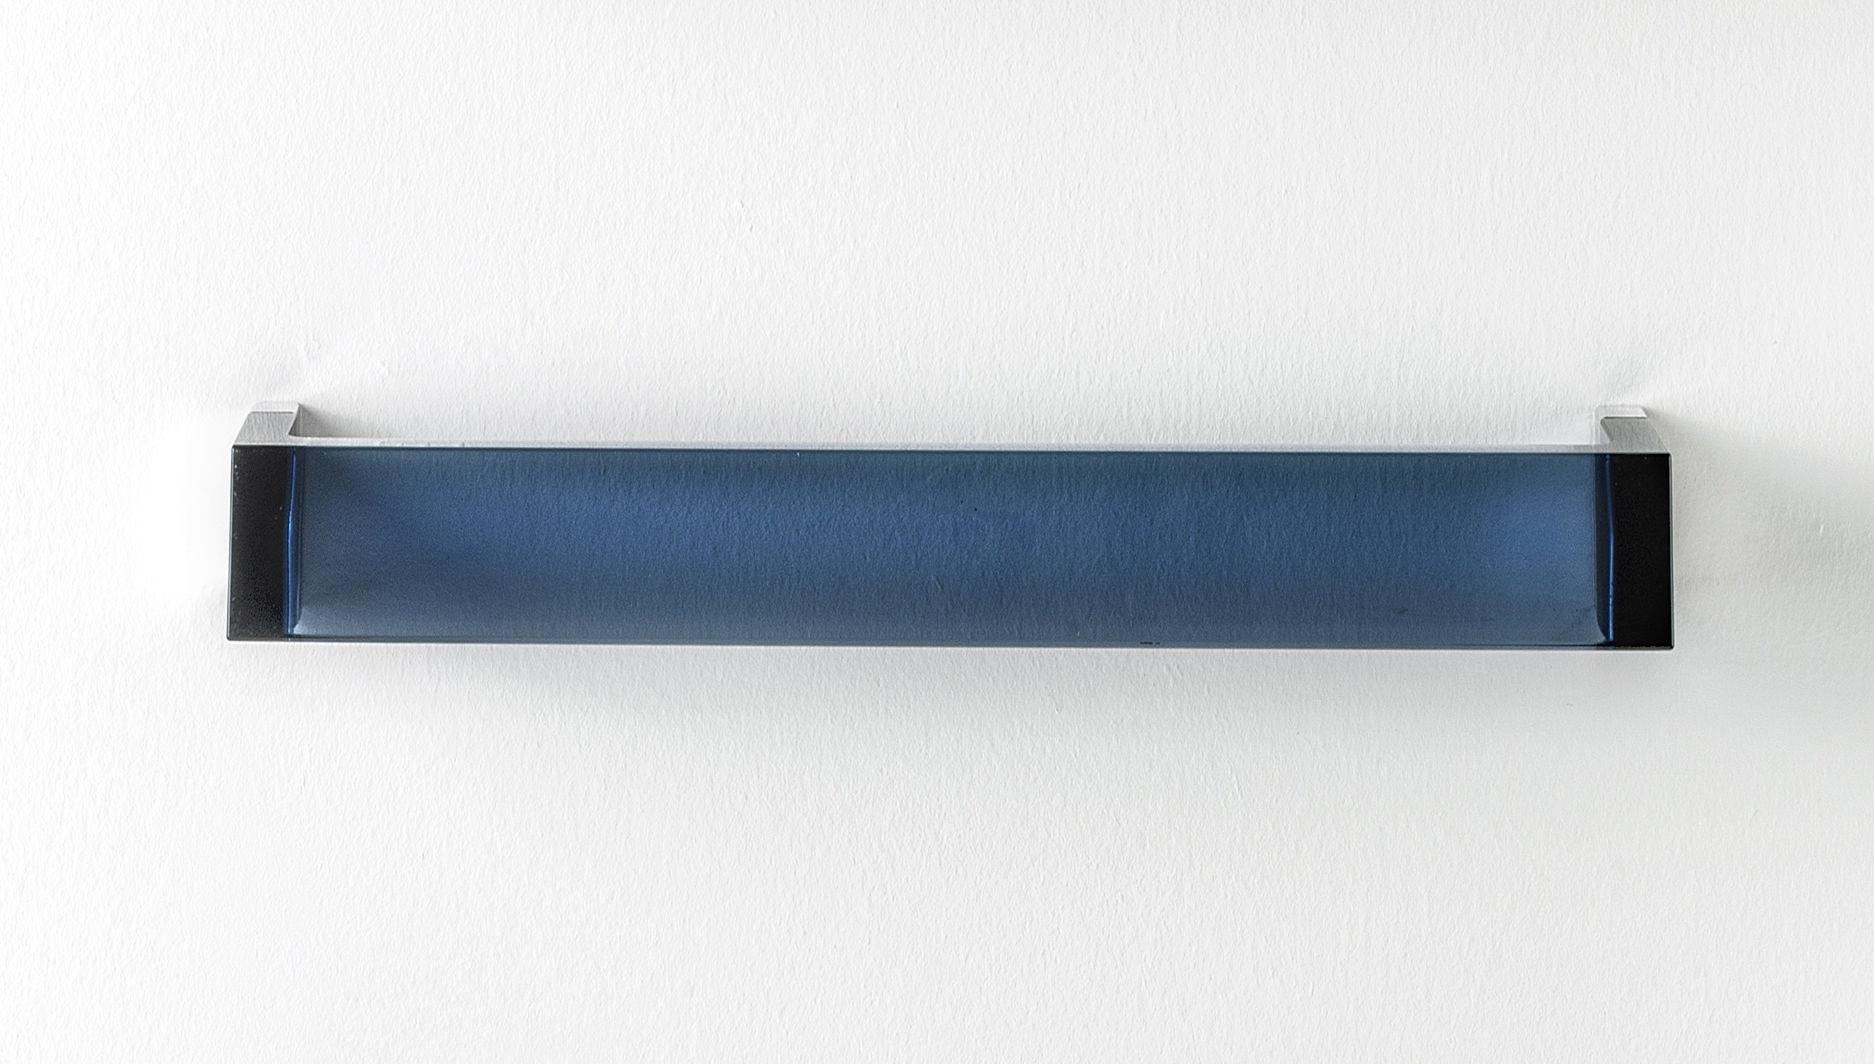 Accessories - Bathroom Accessories - Rail Wall-mounted towel rail by Kartell - Twilight blue - PMMA